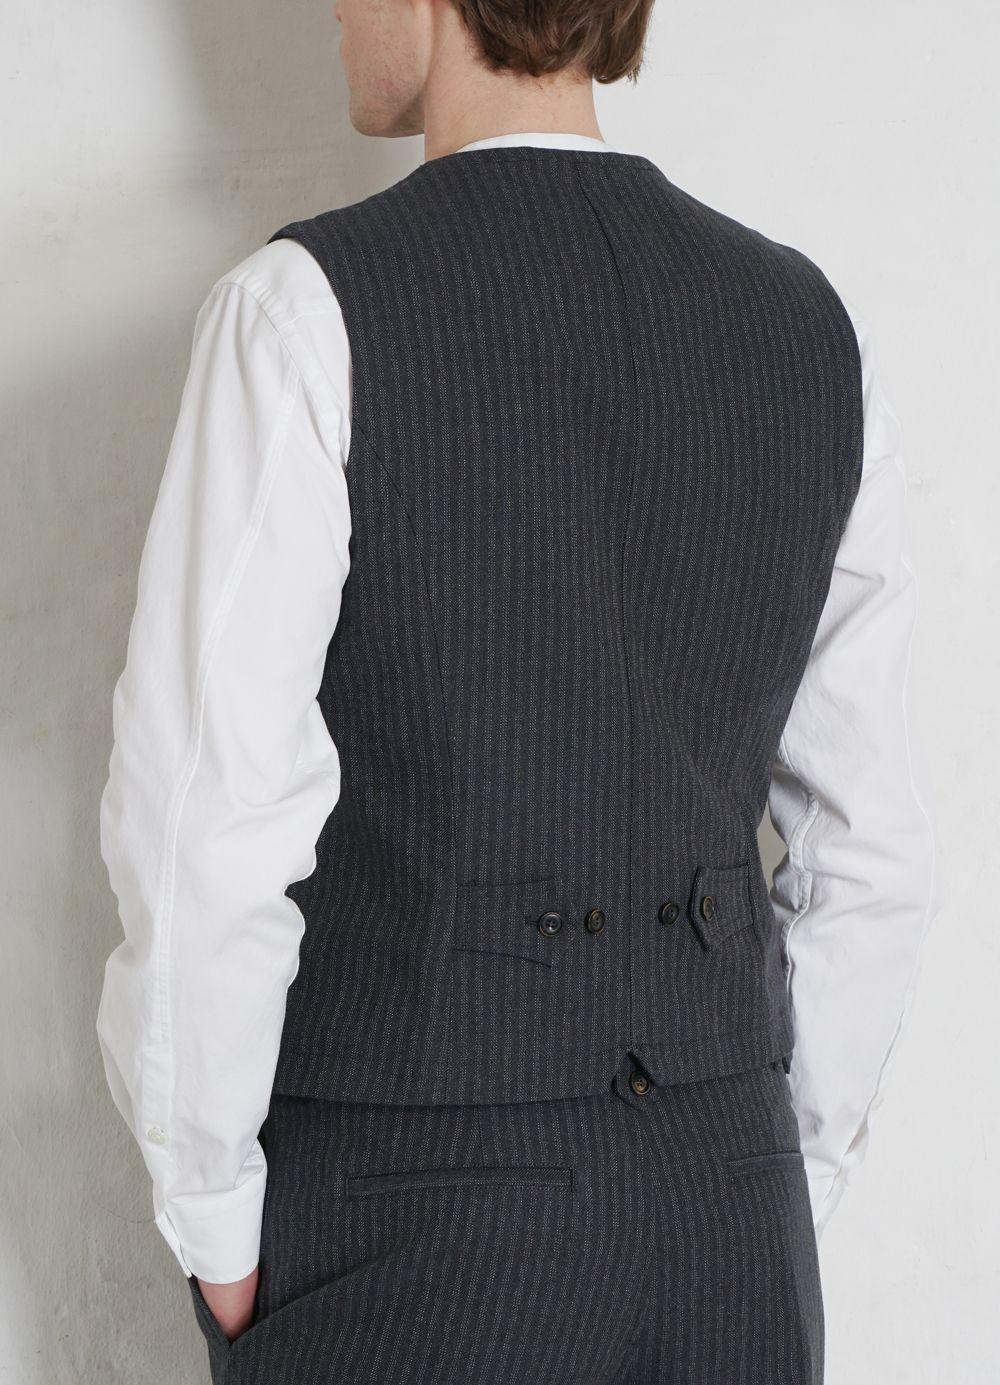 Hansen Garments WILLIAM   Lapel Waistcoat   grey pin